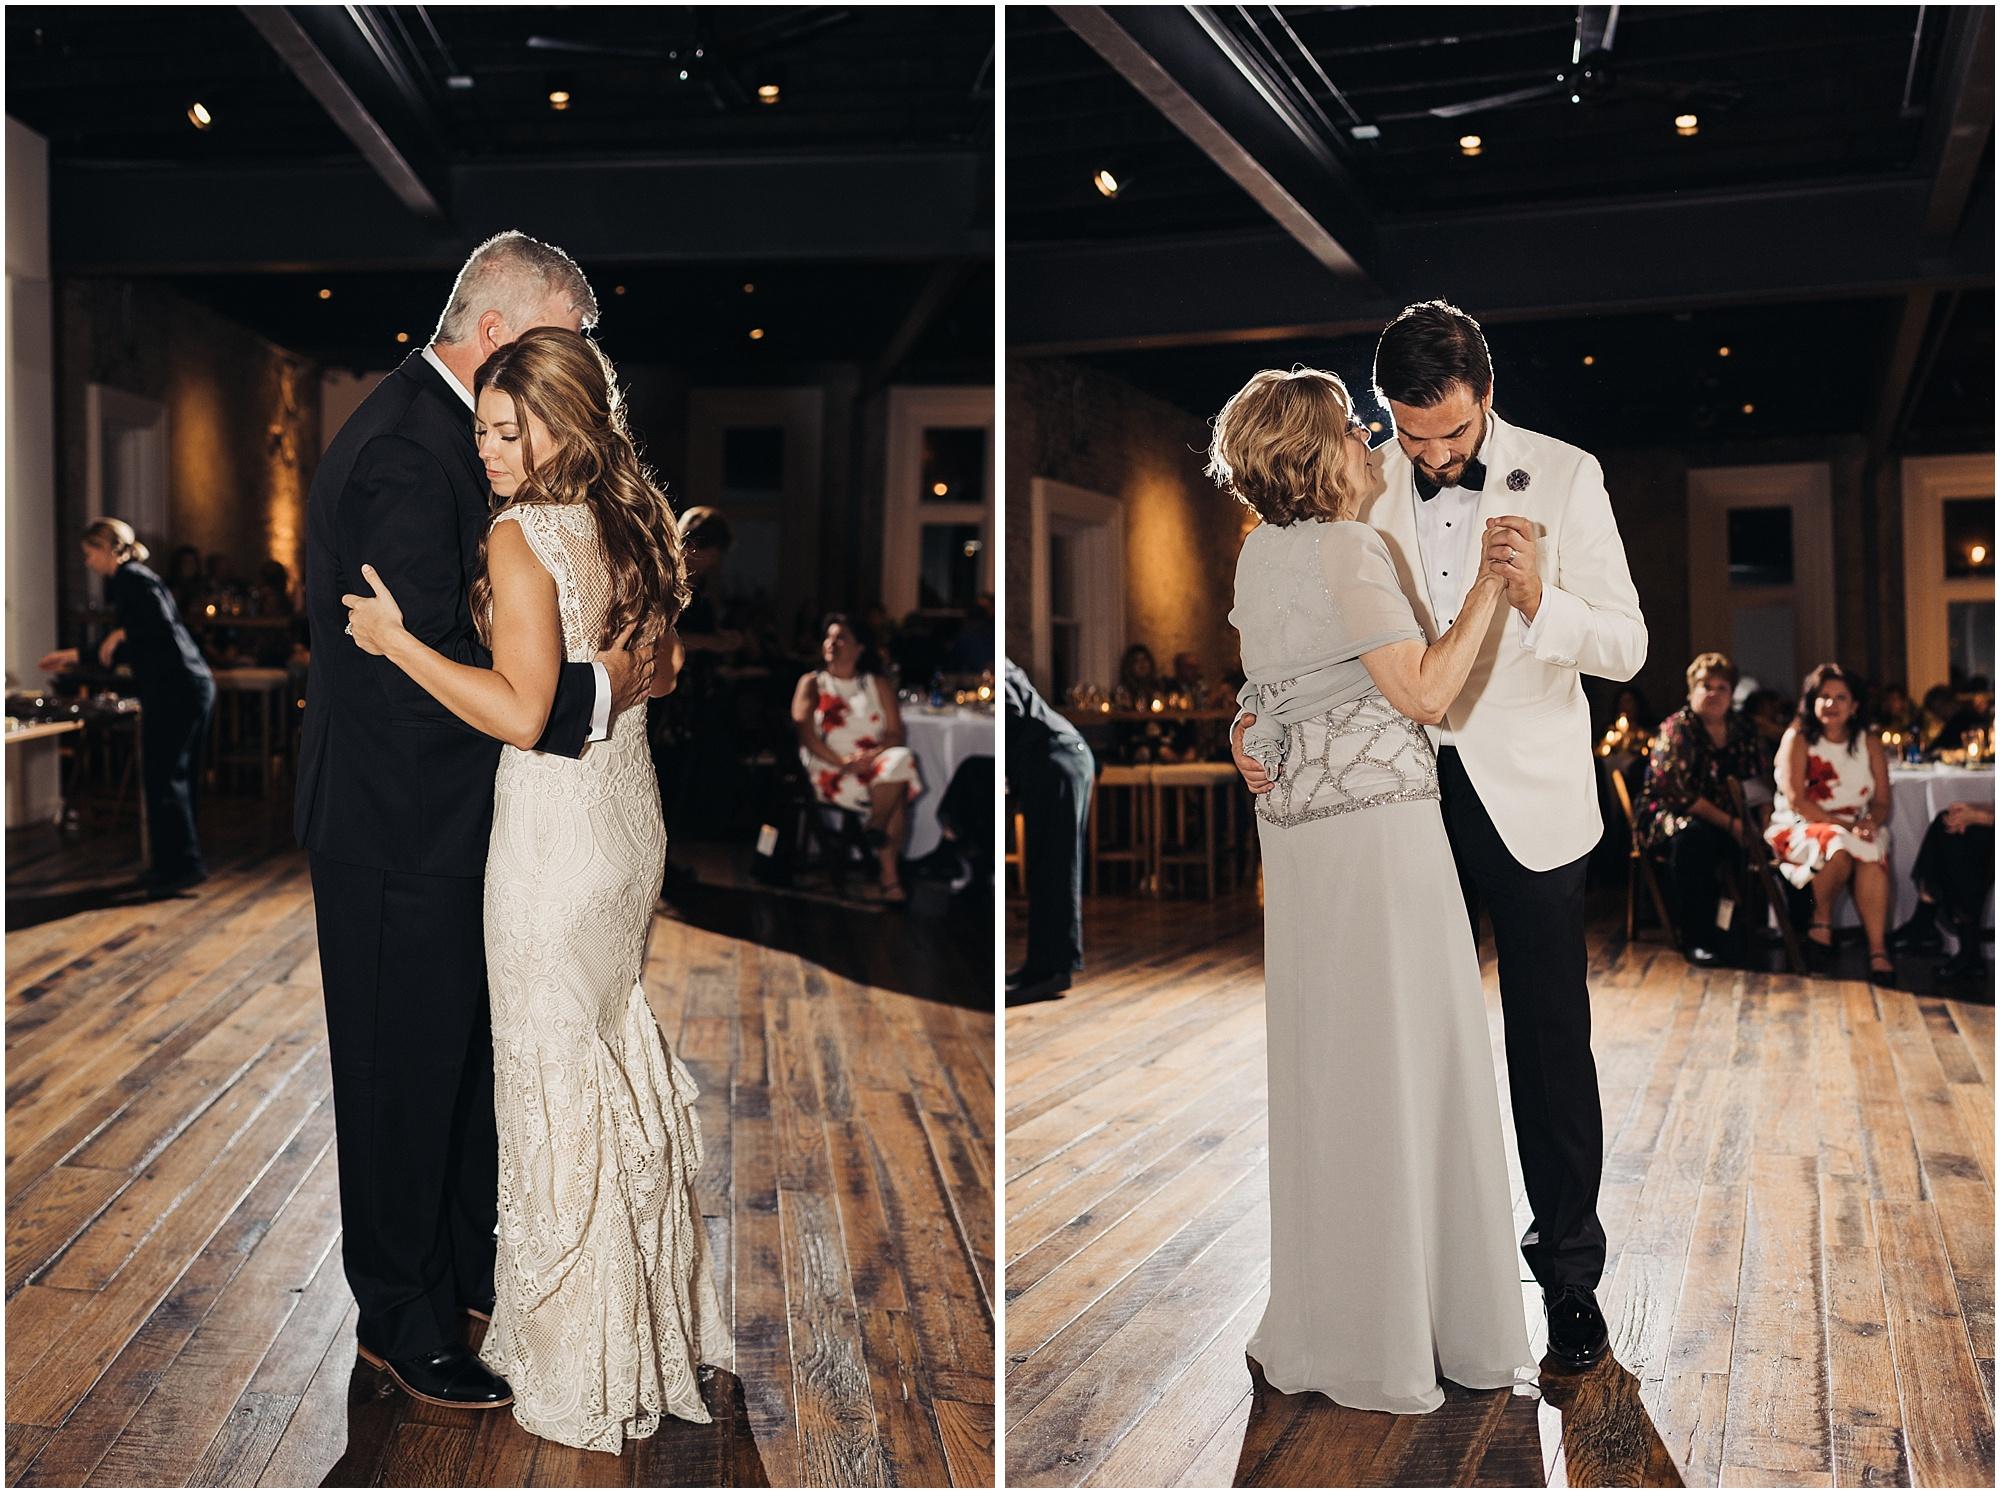 Parent's first dances